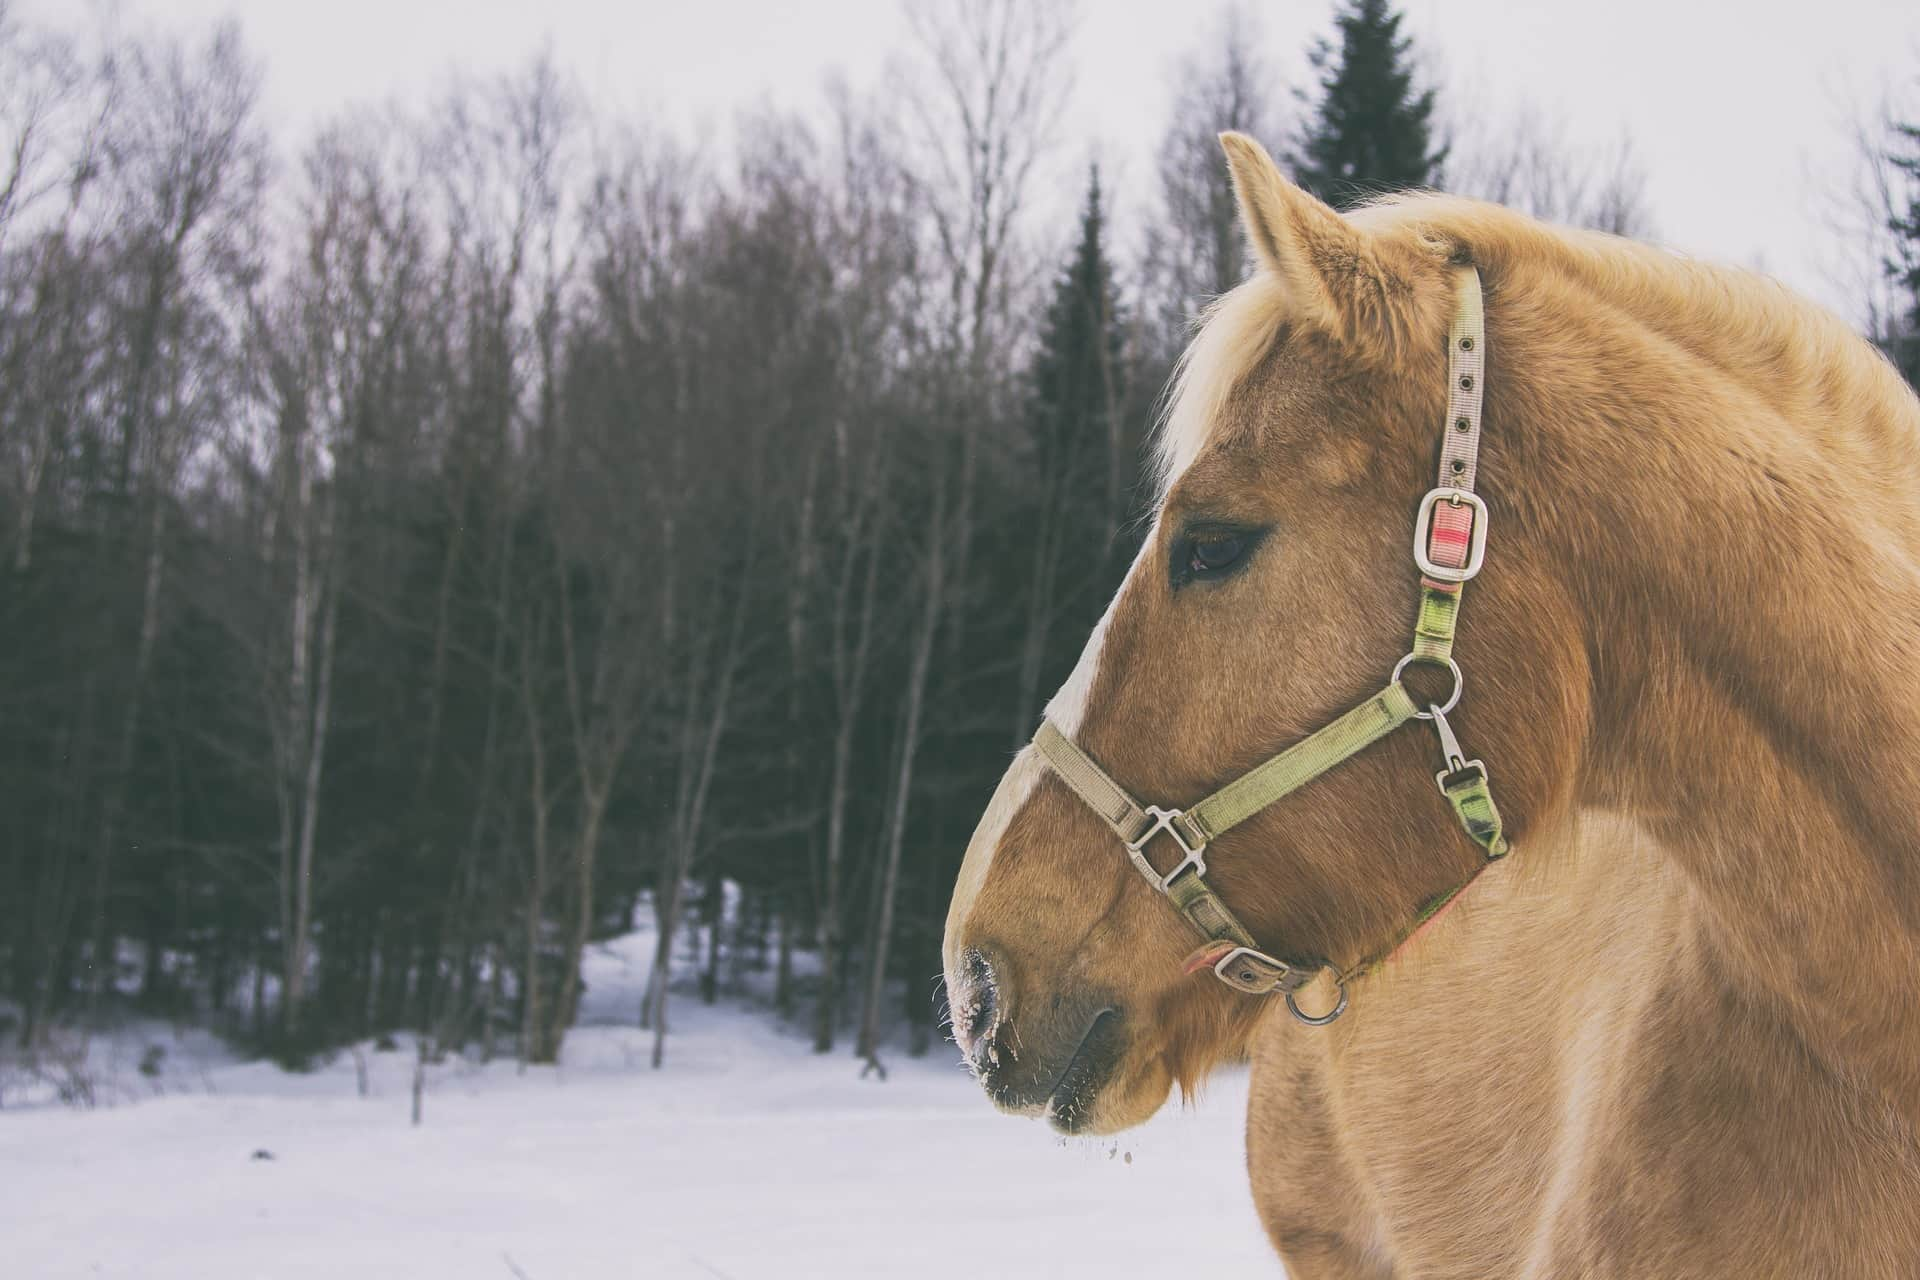 Preparing for Winter Horse Care